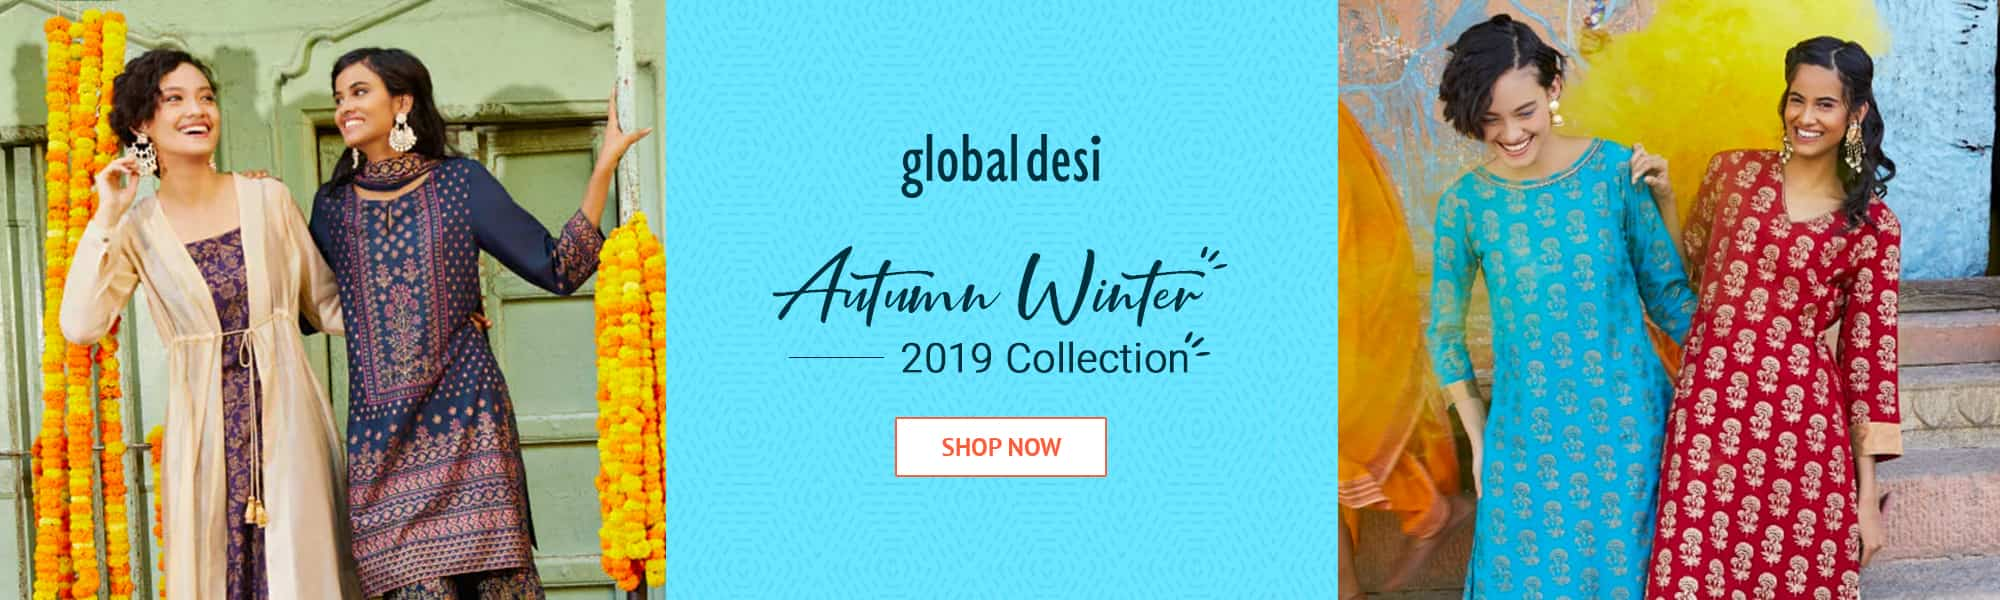 globaldesi offer